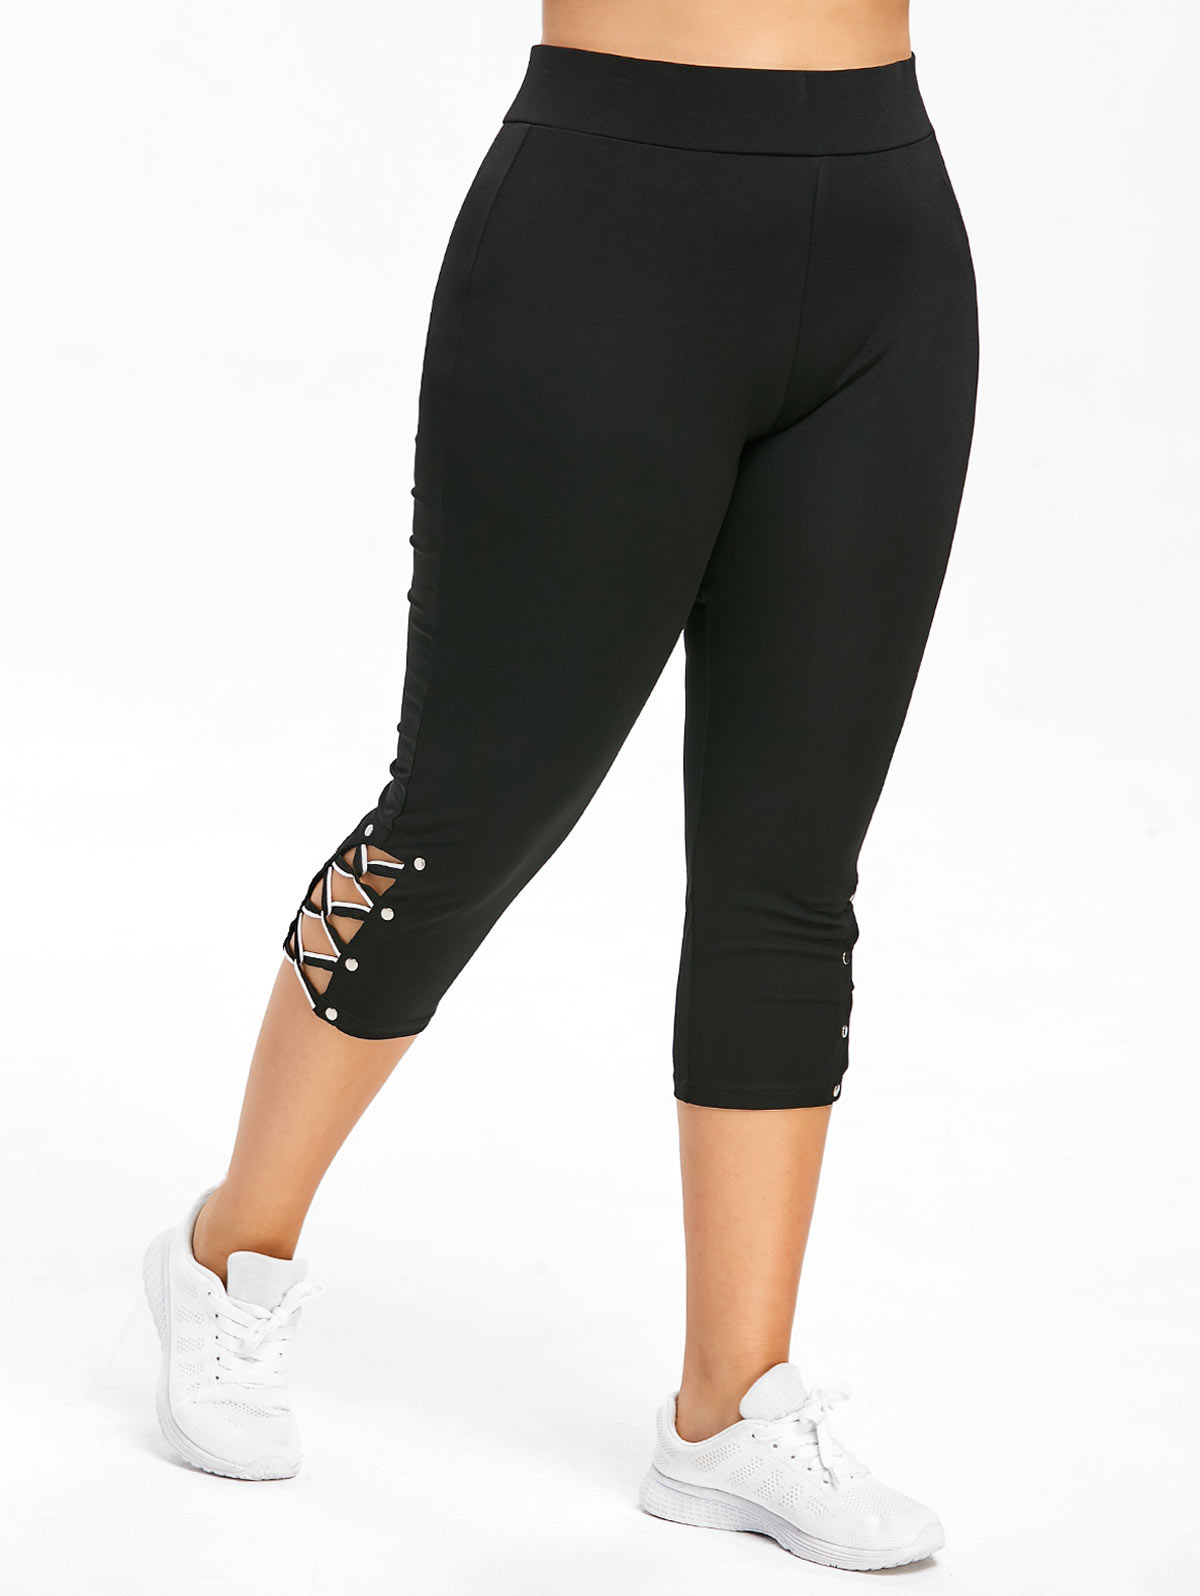 Wipalo Plus Size Criss Cross Capri Leggings Fashion Skinny Solid Mid Waist Women Pants Capri 2019 Summer Lady Trousers 5XL